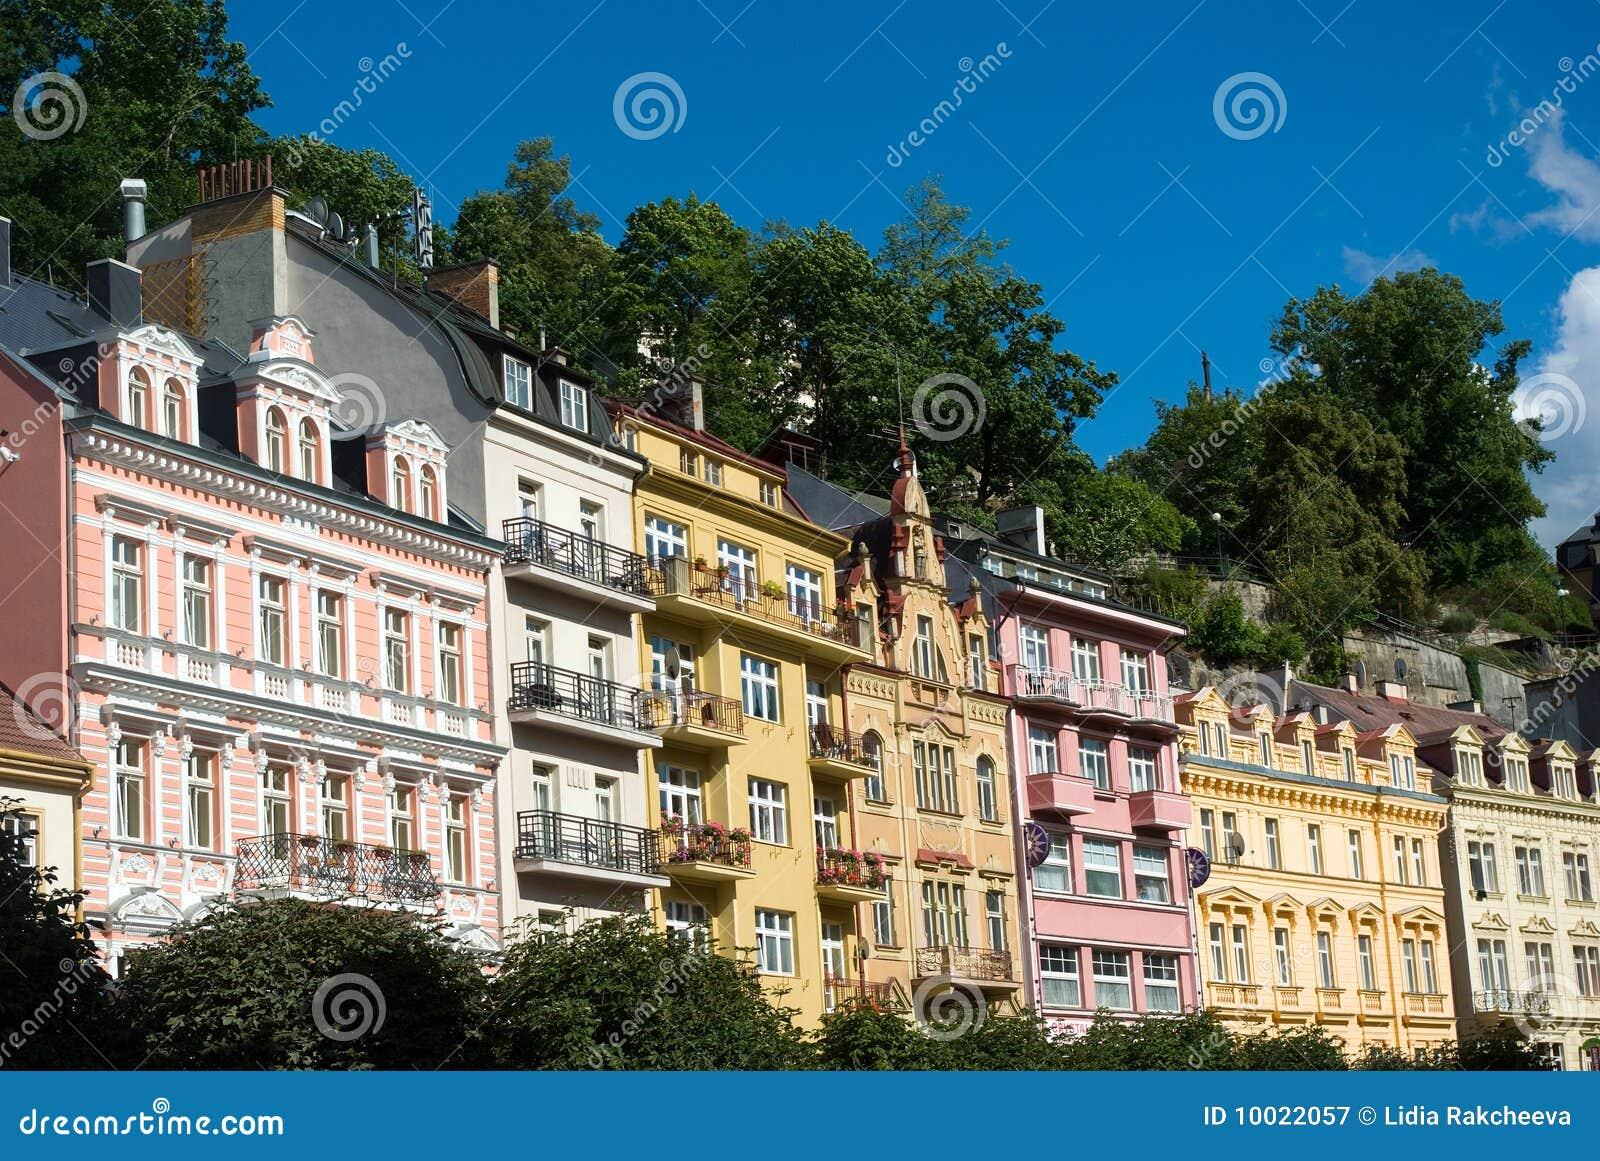 Karlovy Vary House Facades